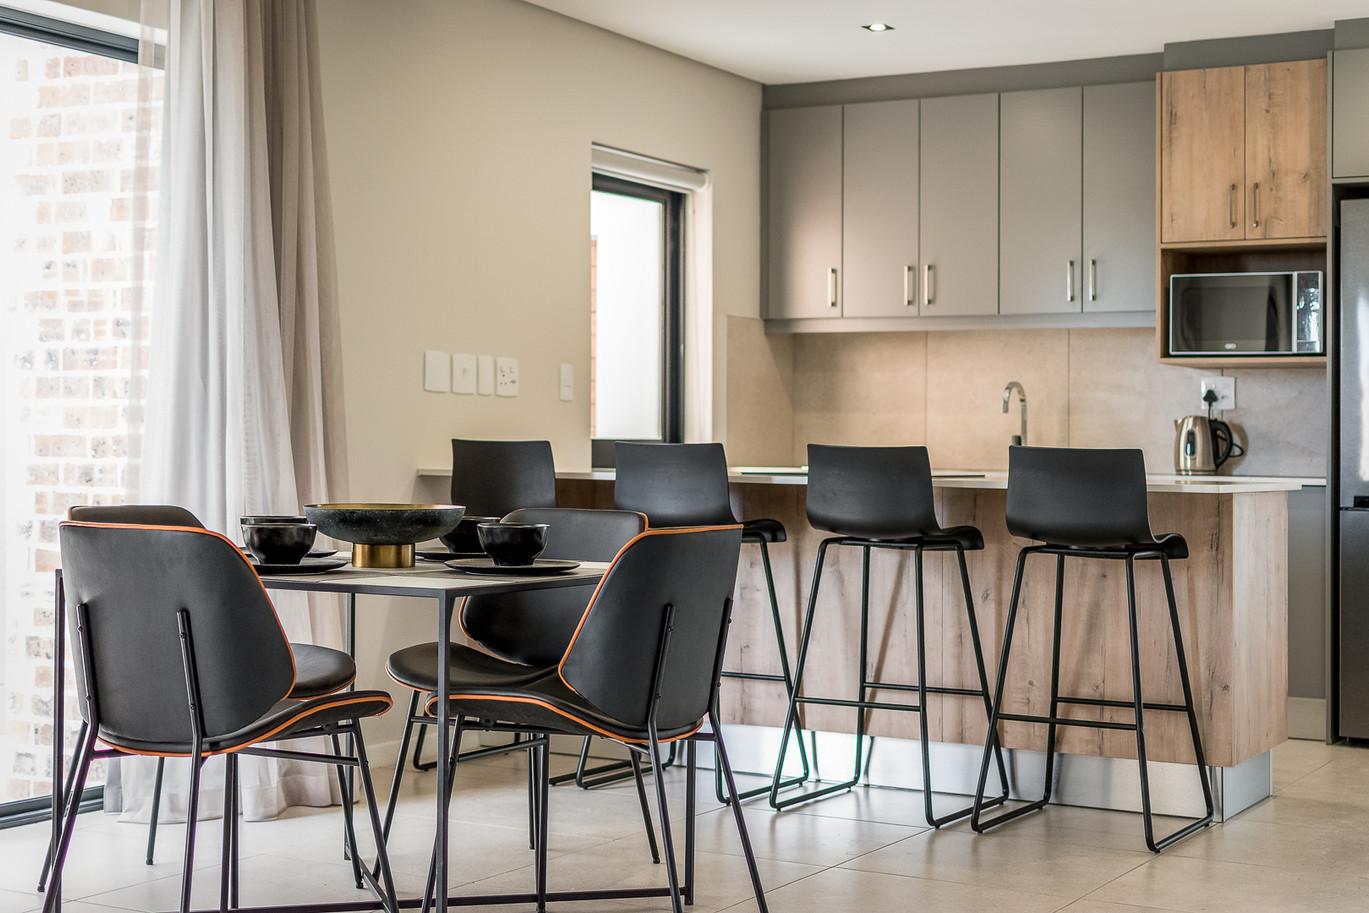 Greystone Kitchen Dining Room.jpg